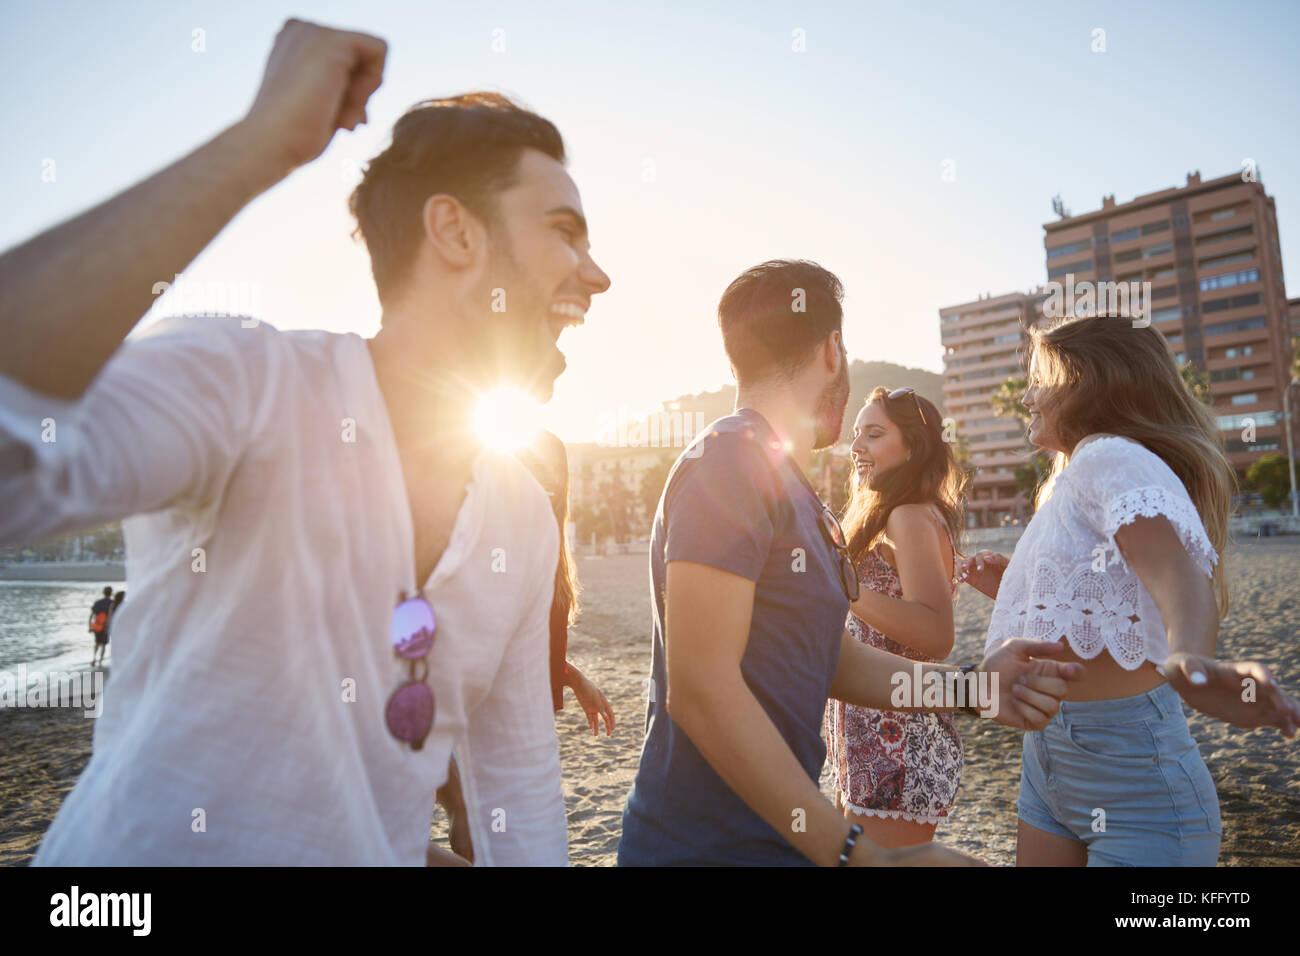 Porträt der jungen Männer tanzen mit Ihren Freundinnen am Strand Stockbild